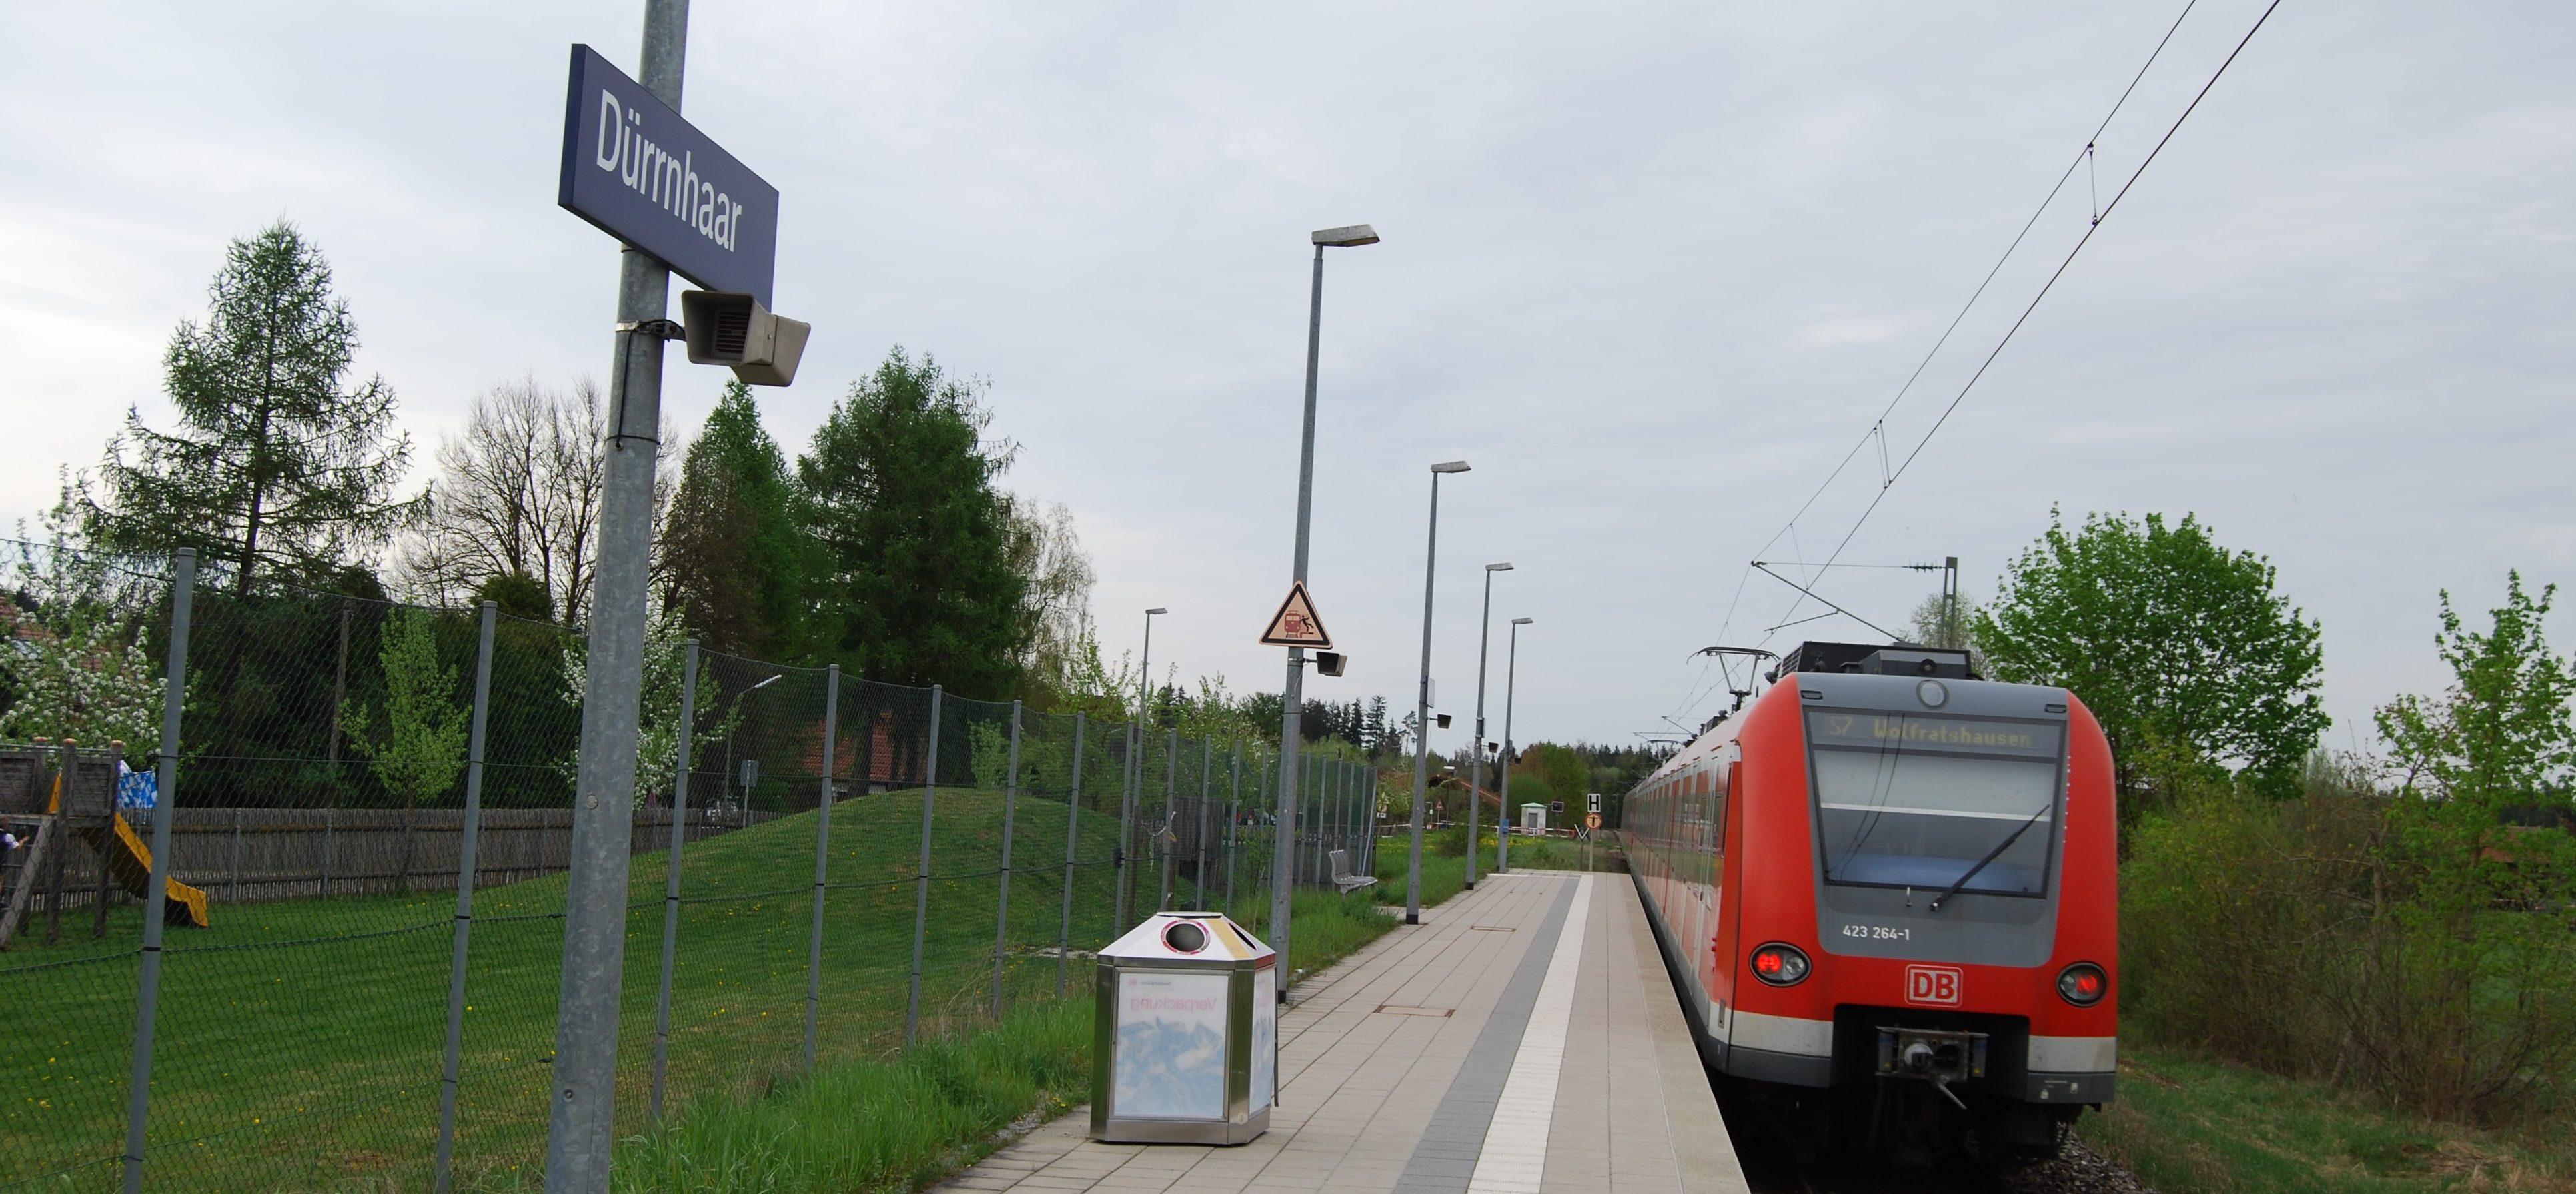 München per S-Bahn